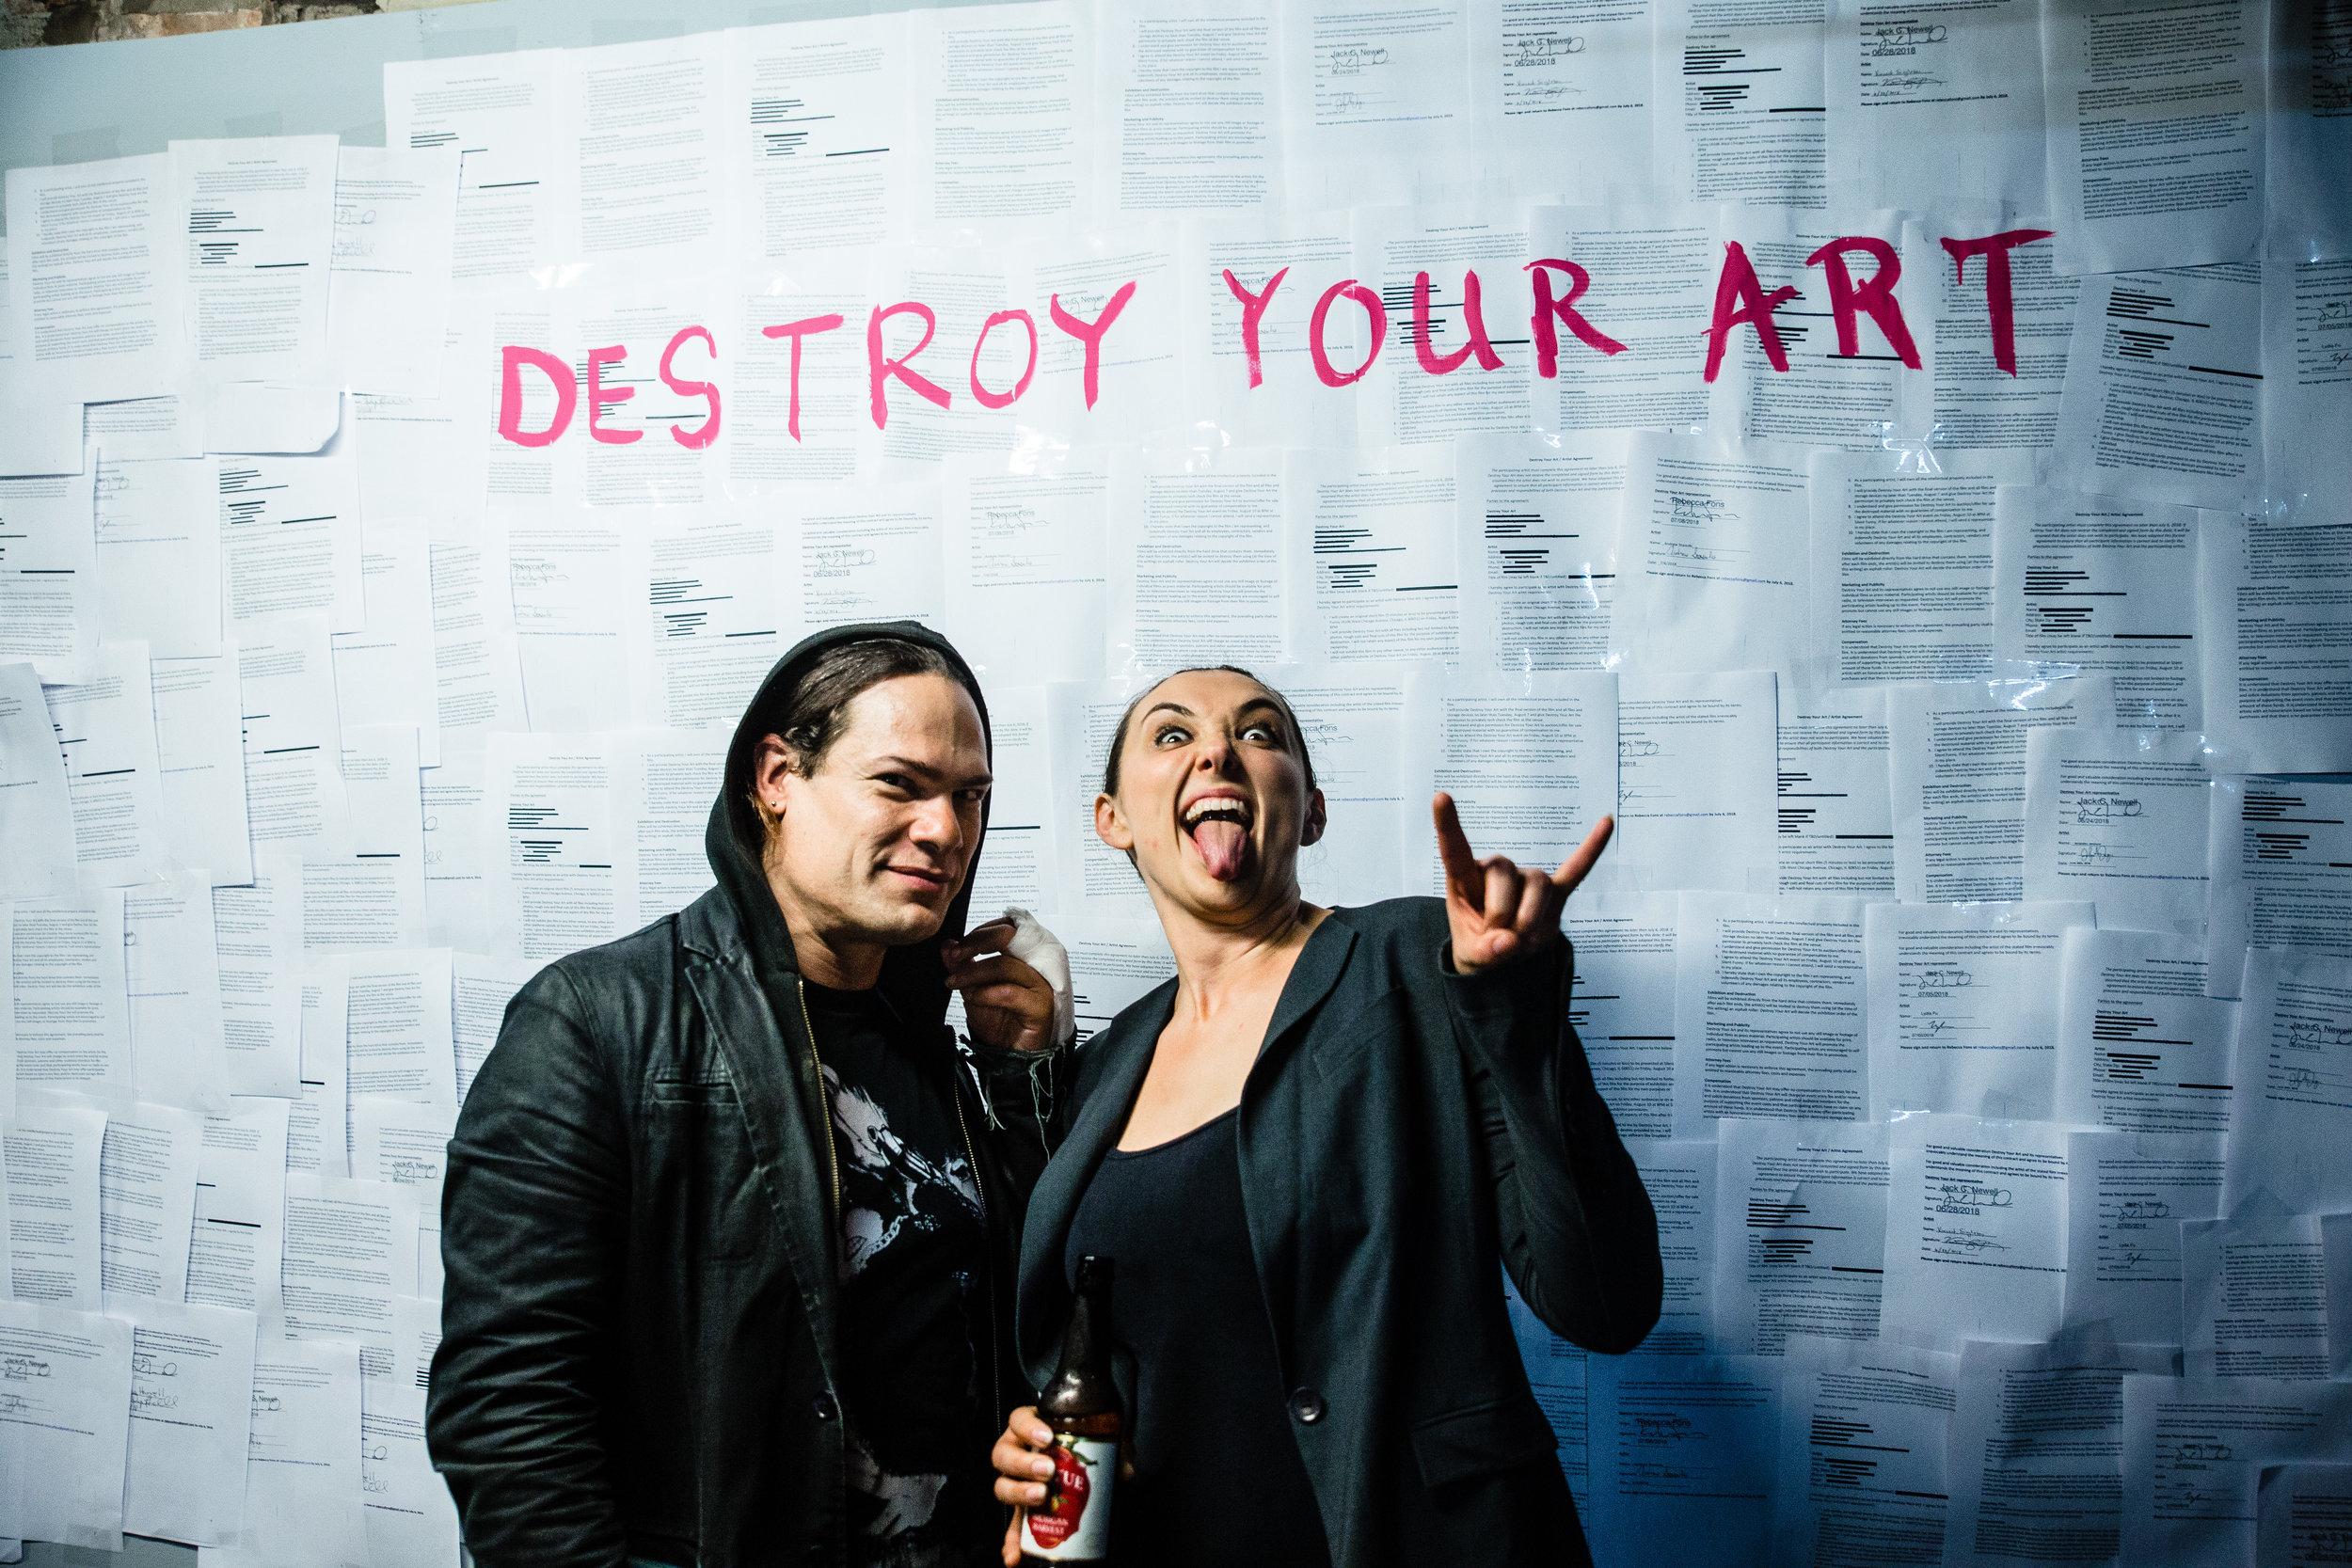 Destroy Your Art 08-10-18 timothymschmidt-1969.jpg